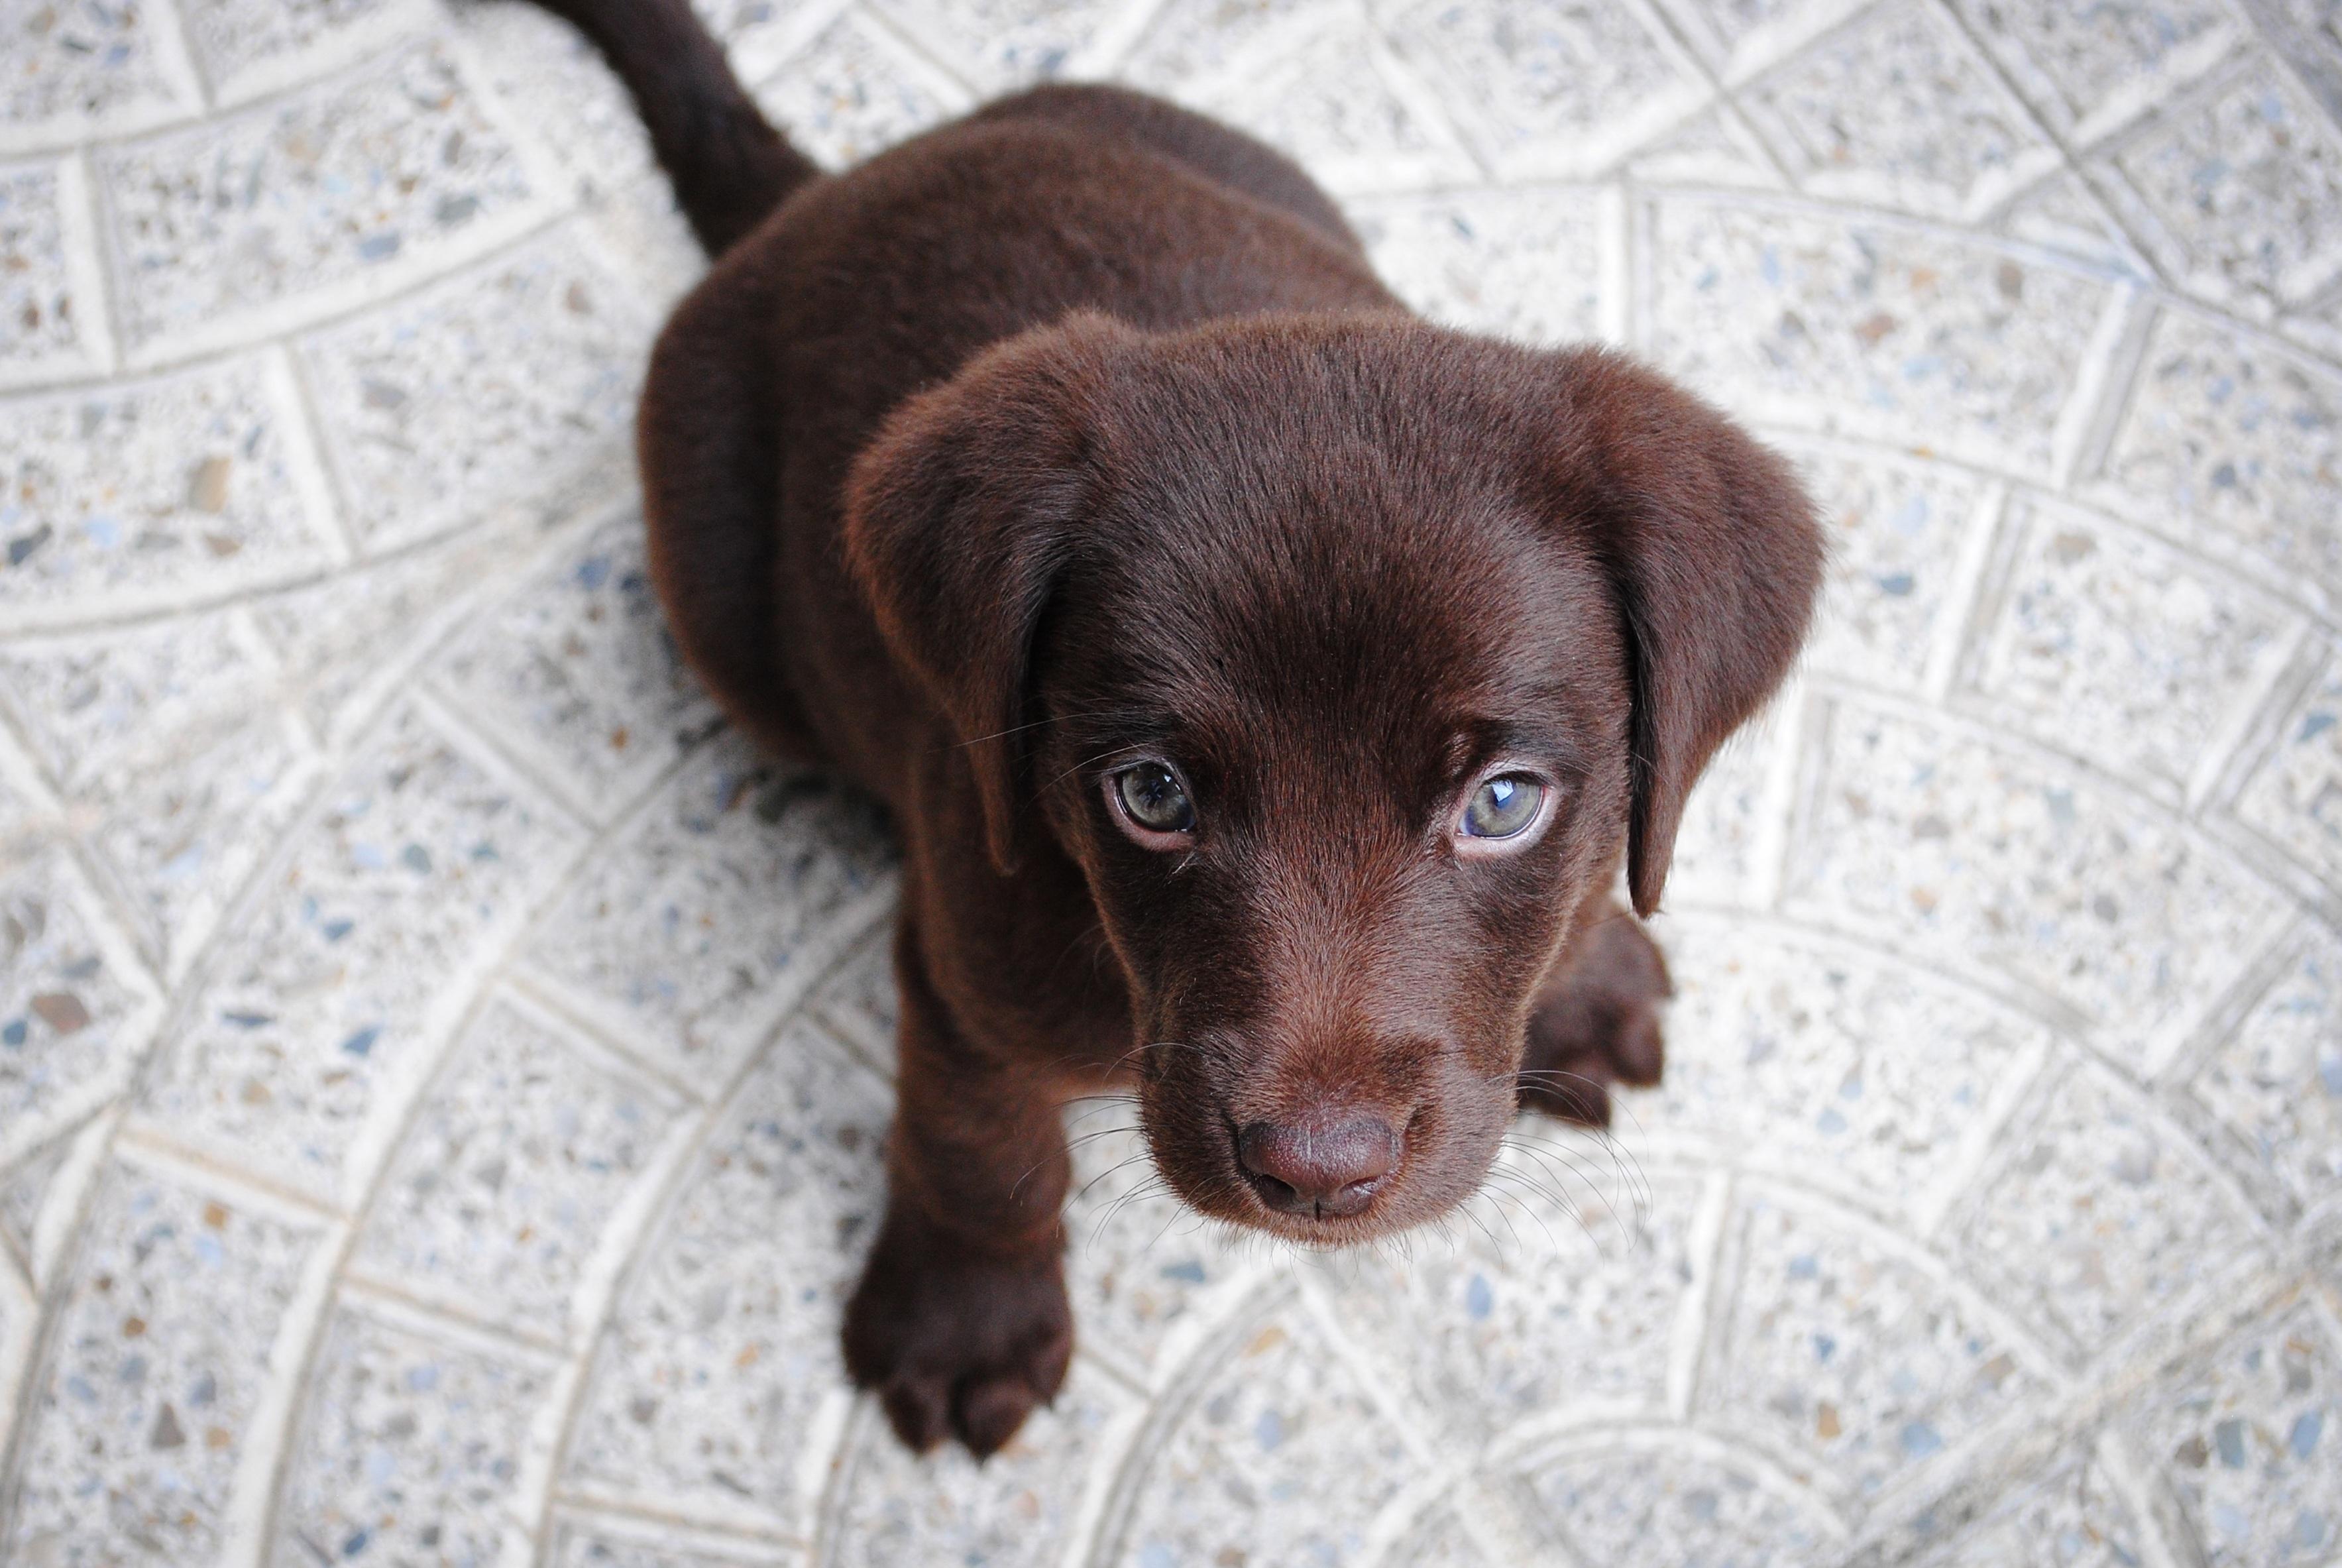 Best Chocolate Brown Adorable Dog - puppy-dog-animal-cute-canine-pet-portrait-sitting-brown-mammal-chocolate-vertebrate-labrador-retriever-adorable-labrador-dog-breed-retriever-pup-doggy-lab-purebred-pedigree-cute-puppy-dog-like-mammal-664906  Pic_62857  .jpg